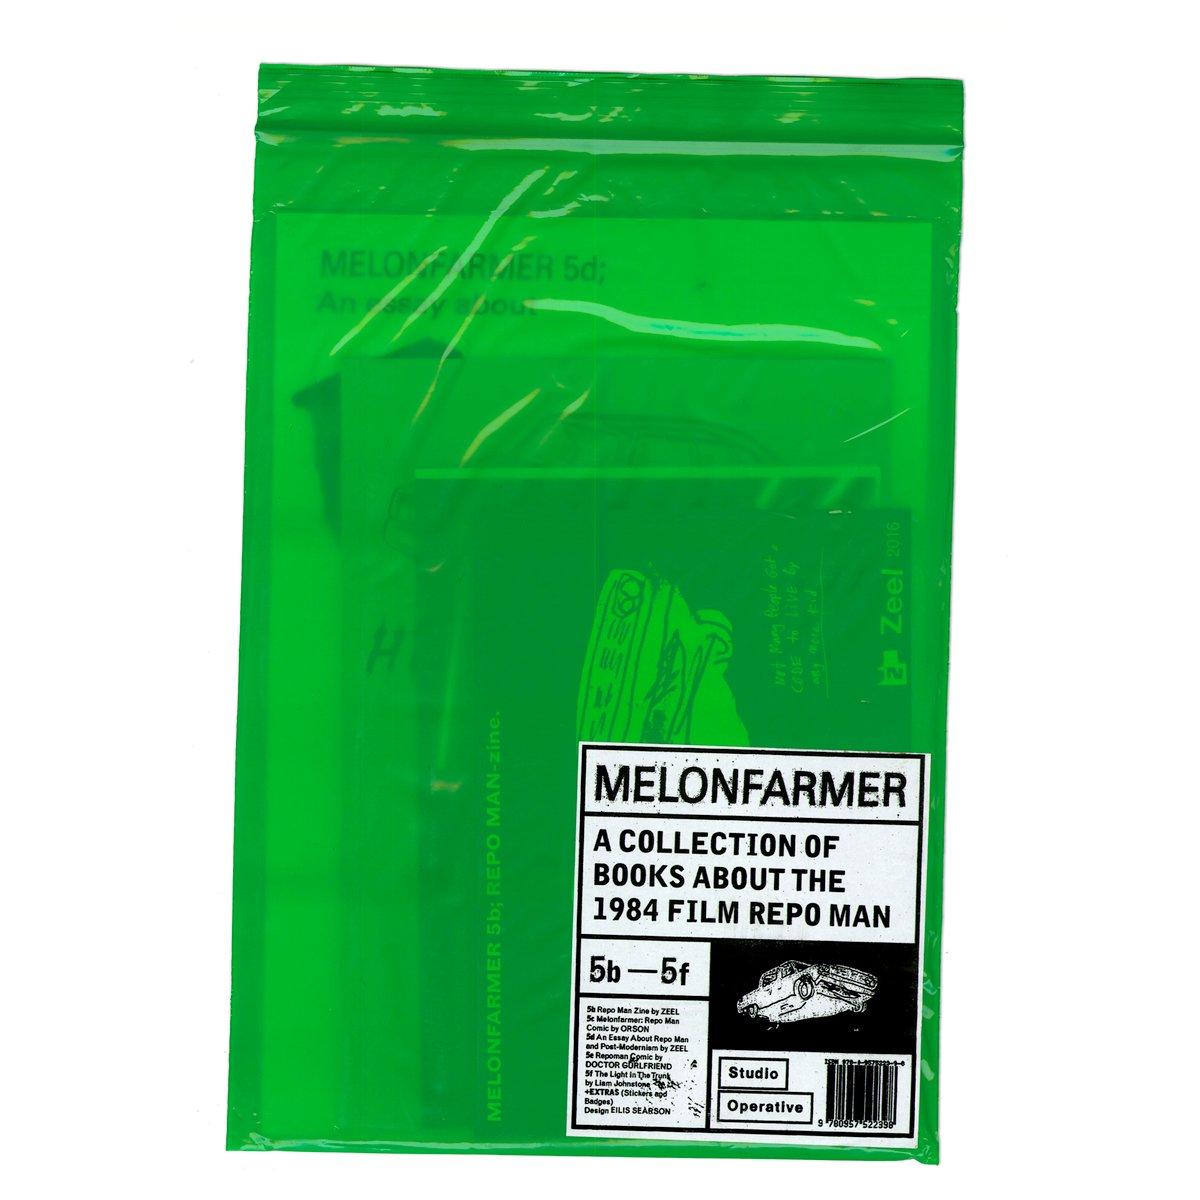 Image of Melonfarmer 5b-5f